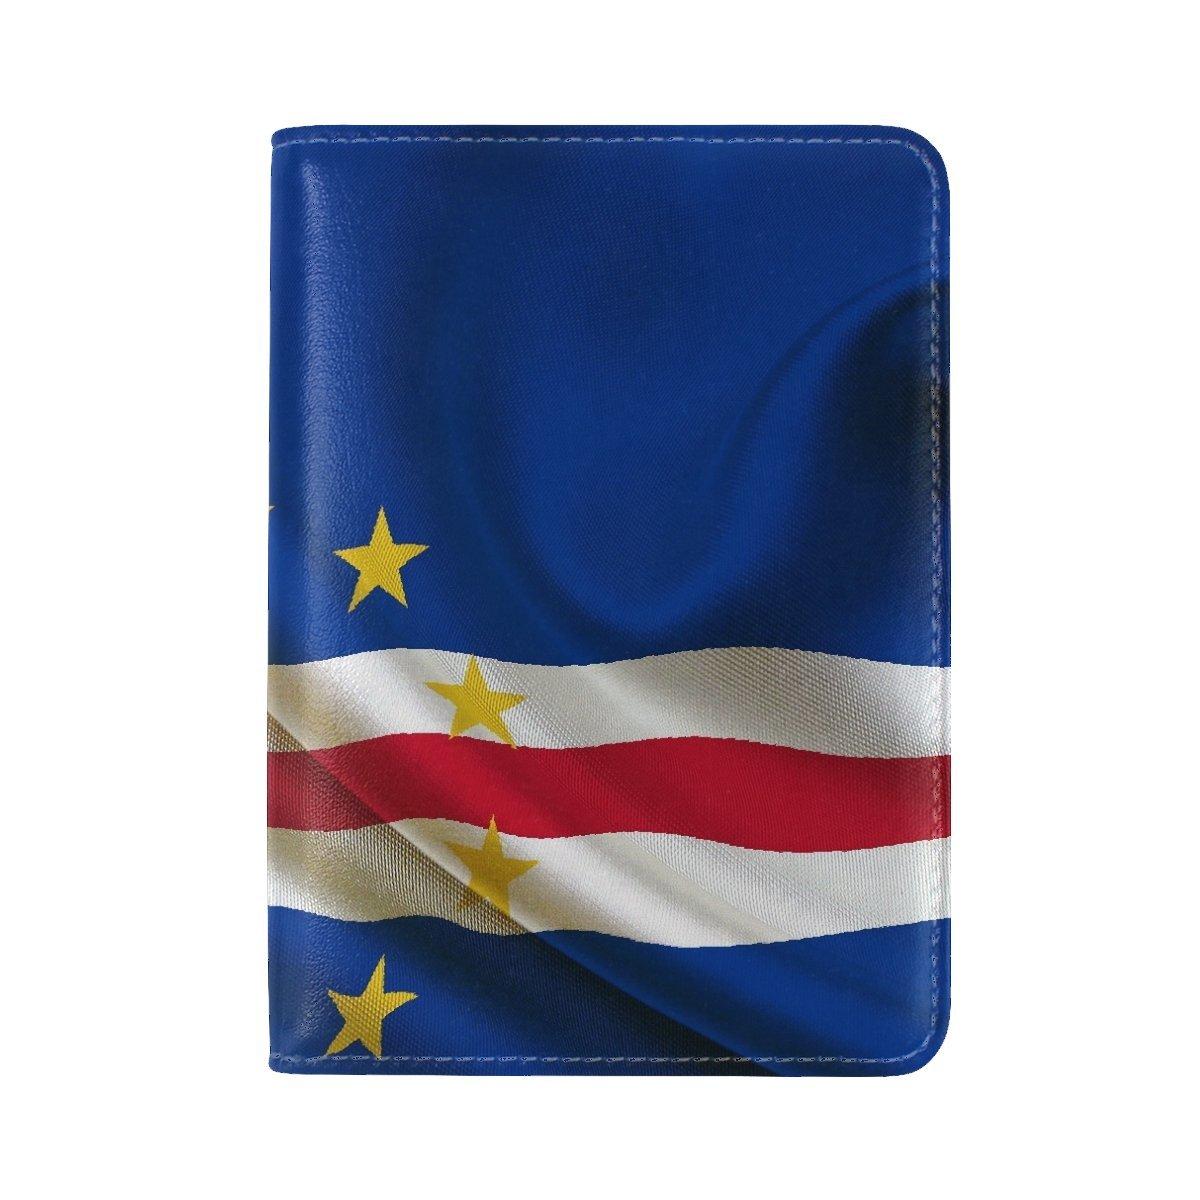 National Flag Republic Cape Verde Leather Passport Holder Cover Case Travel One Pocket